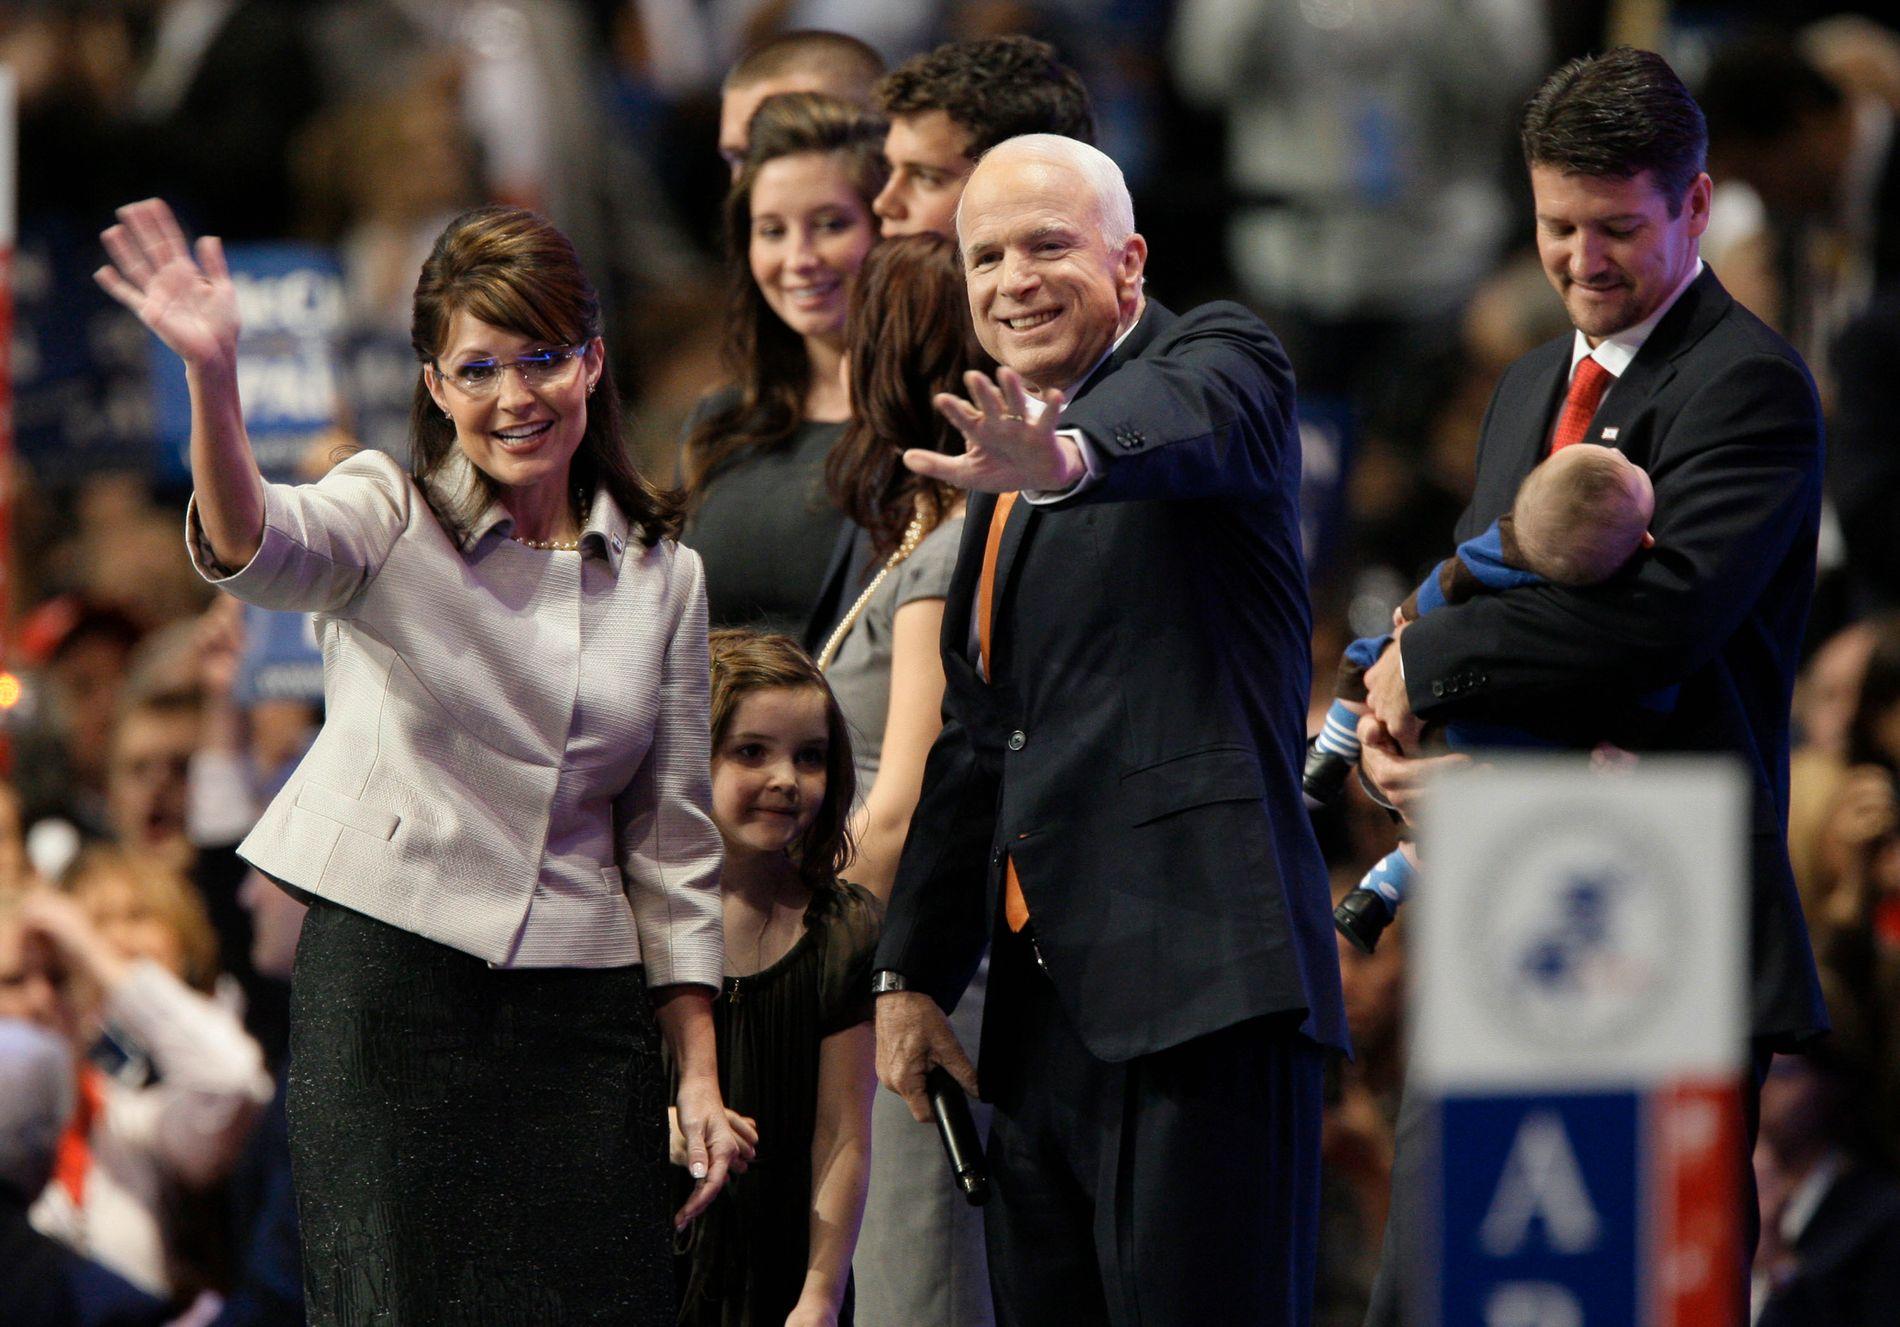 Sarah Palin og John McCain under presidentvalgkampen i 2008. McCain sa senere at han angrep på at han valgte Palin som sin visepresidentkandidat. Arkivfoto: AP / NTB scanpix